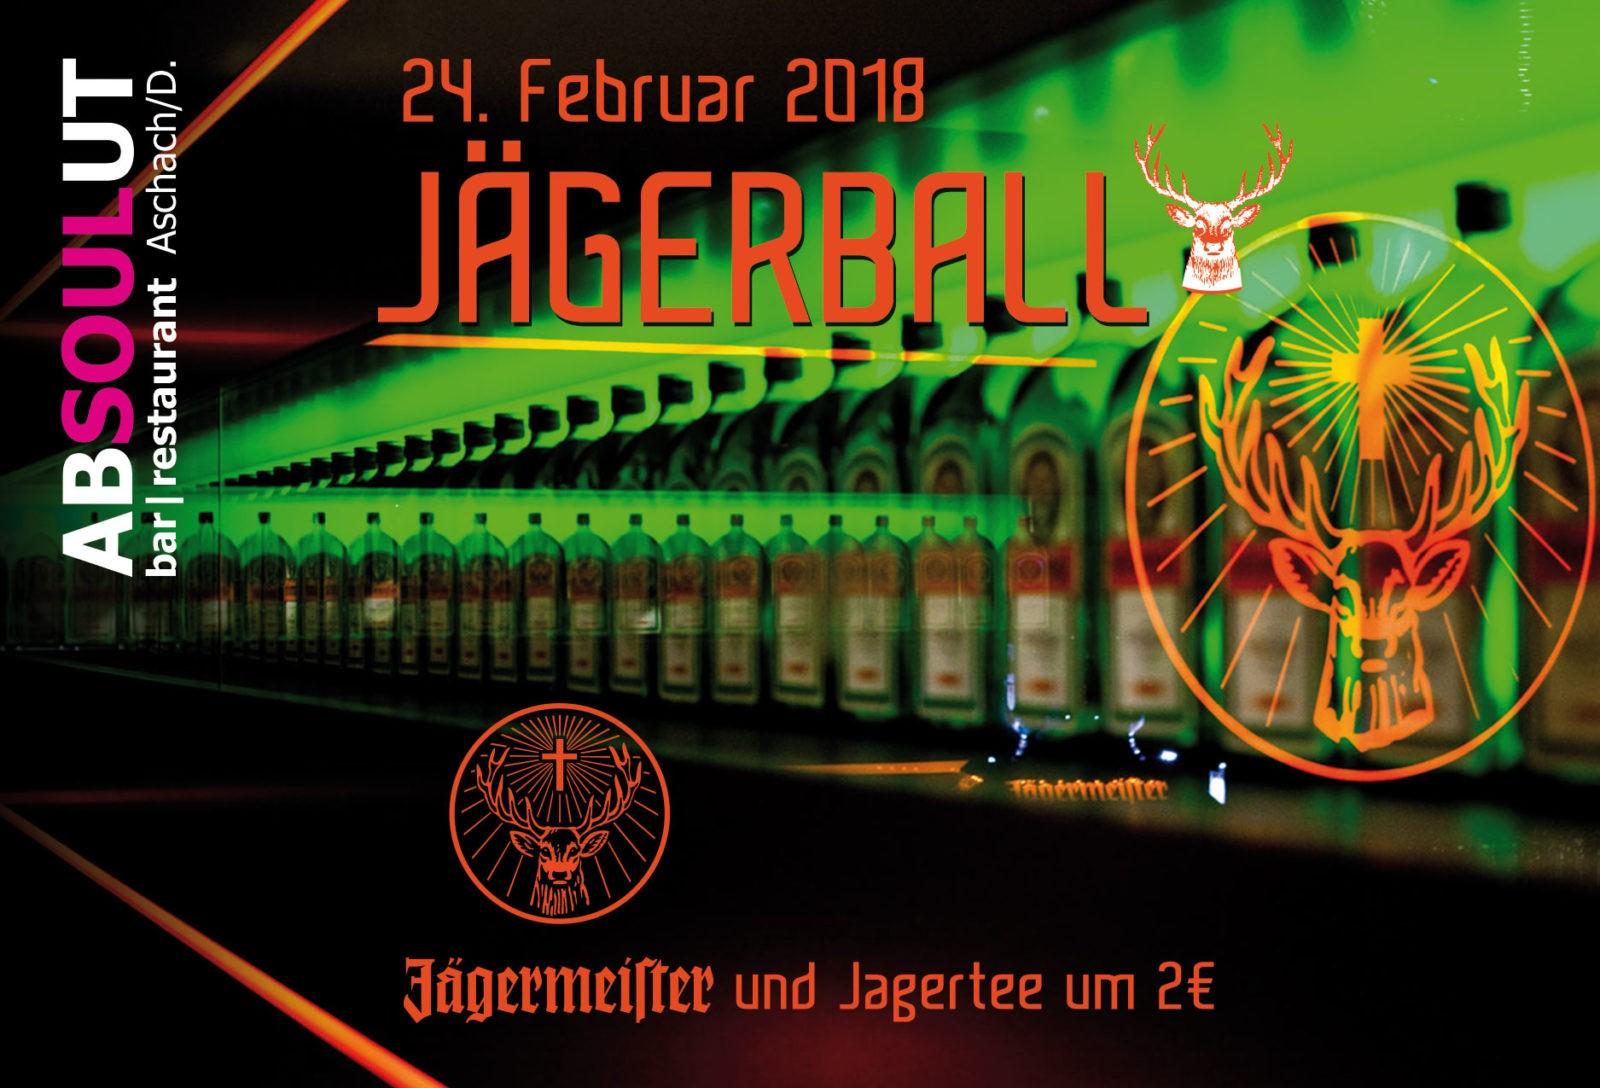 Absolut Bar Restaurant Events Jägerball